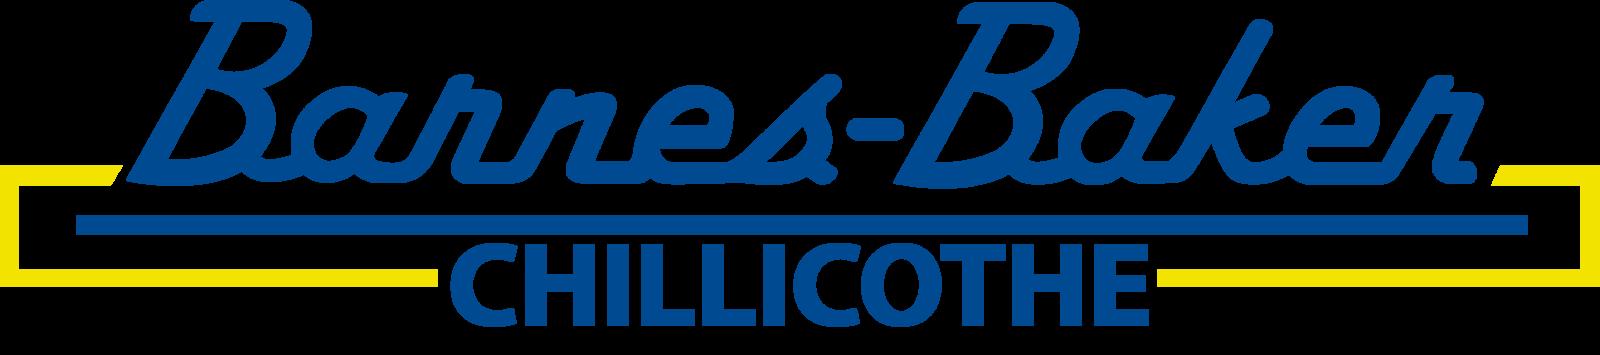 Chillicothe Car Dealers